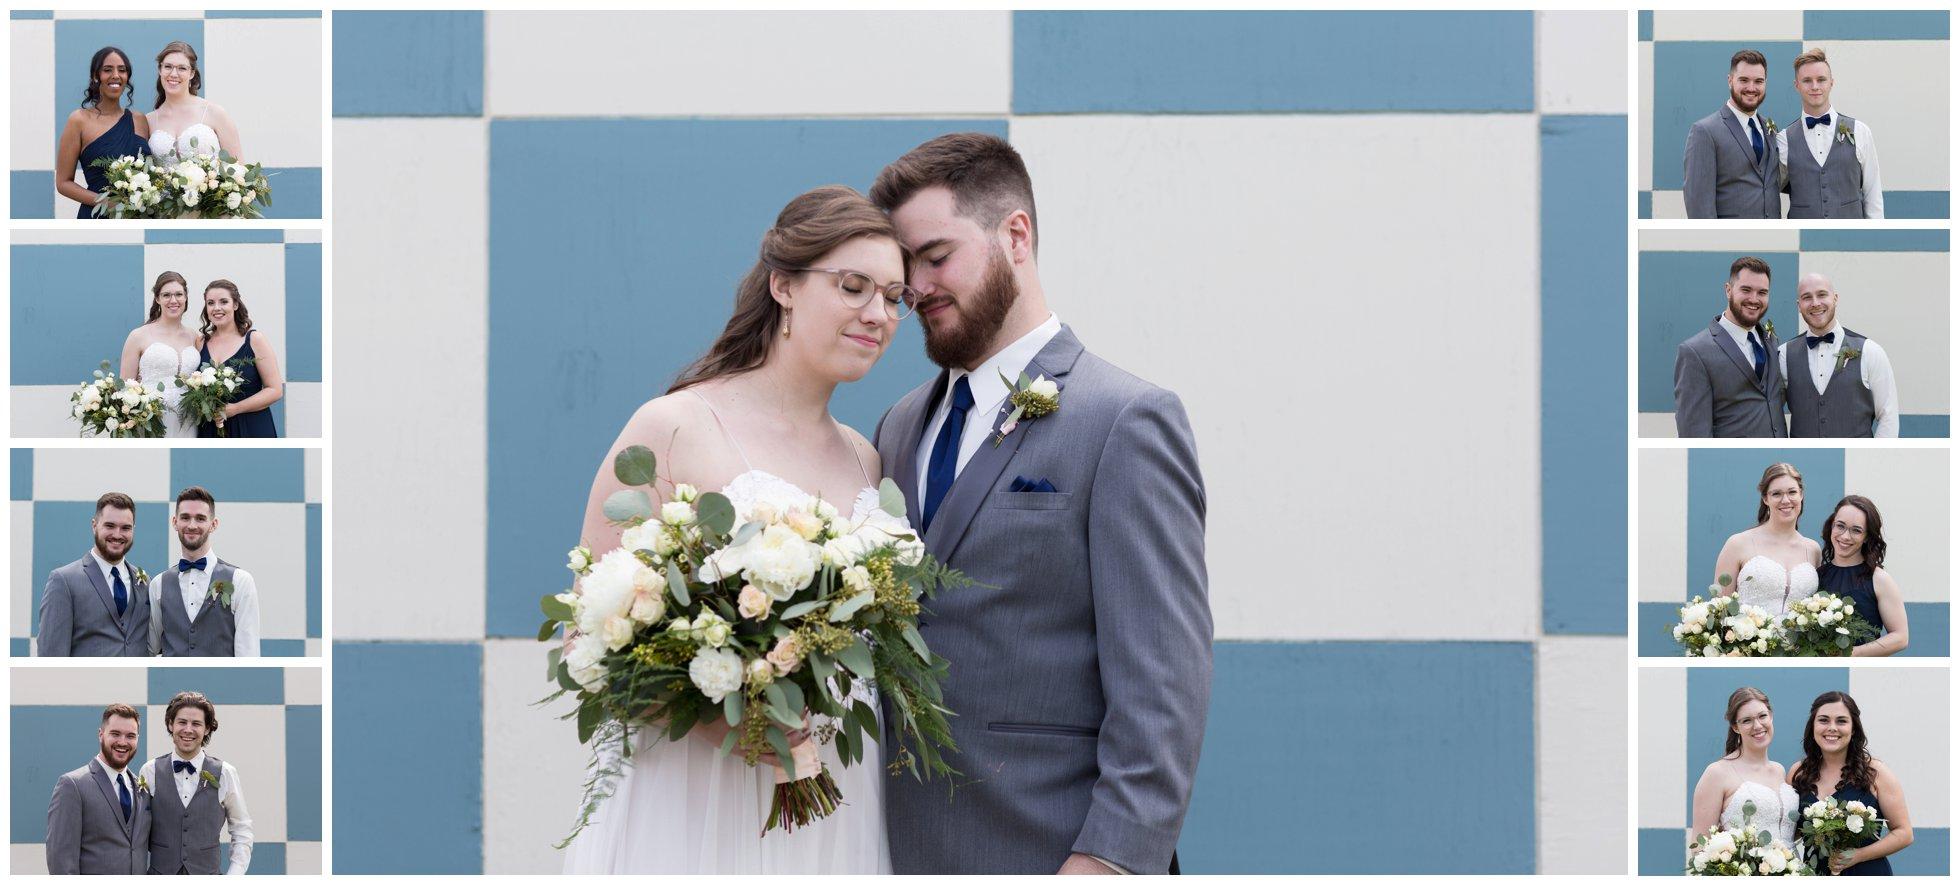 Emily and Royden Edmonton Wedding (Life by Selena Photography)_0030.jpg